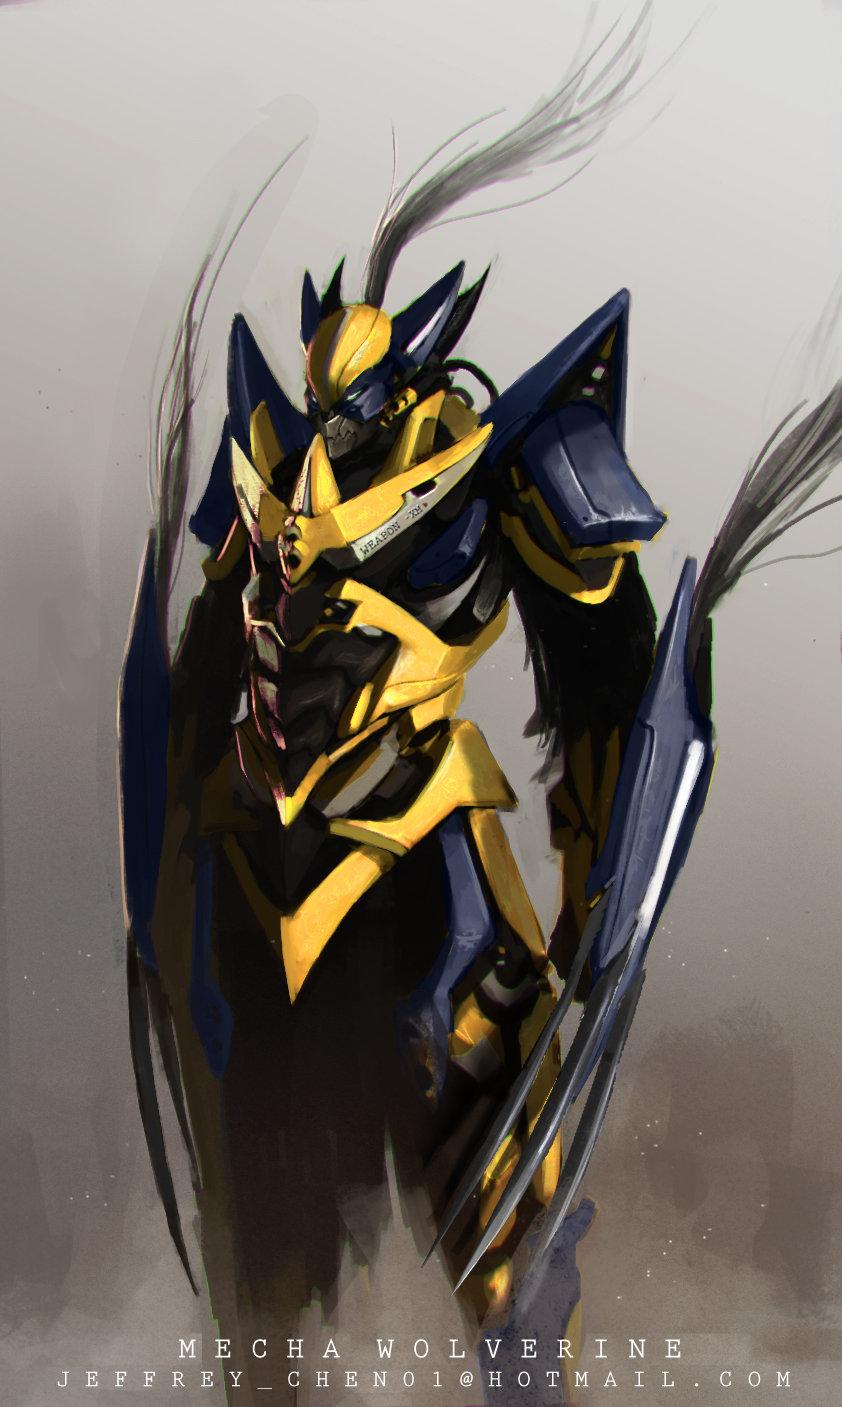 Mecha Wolverine